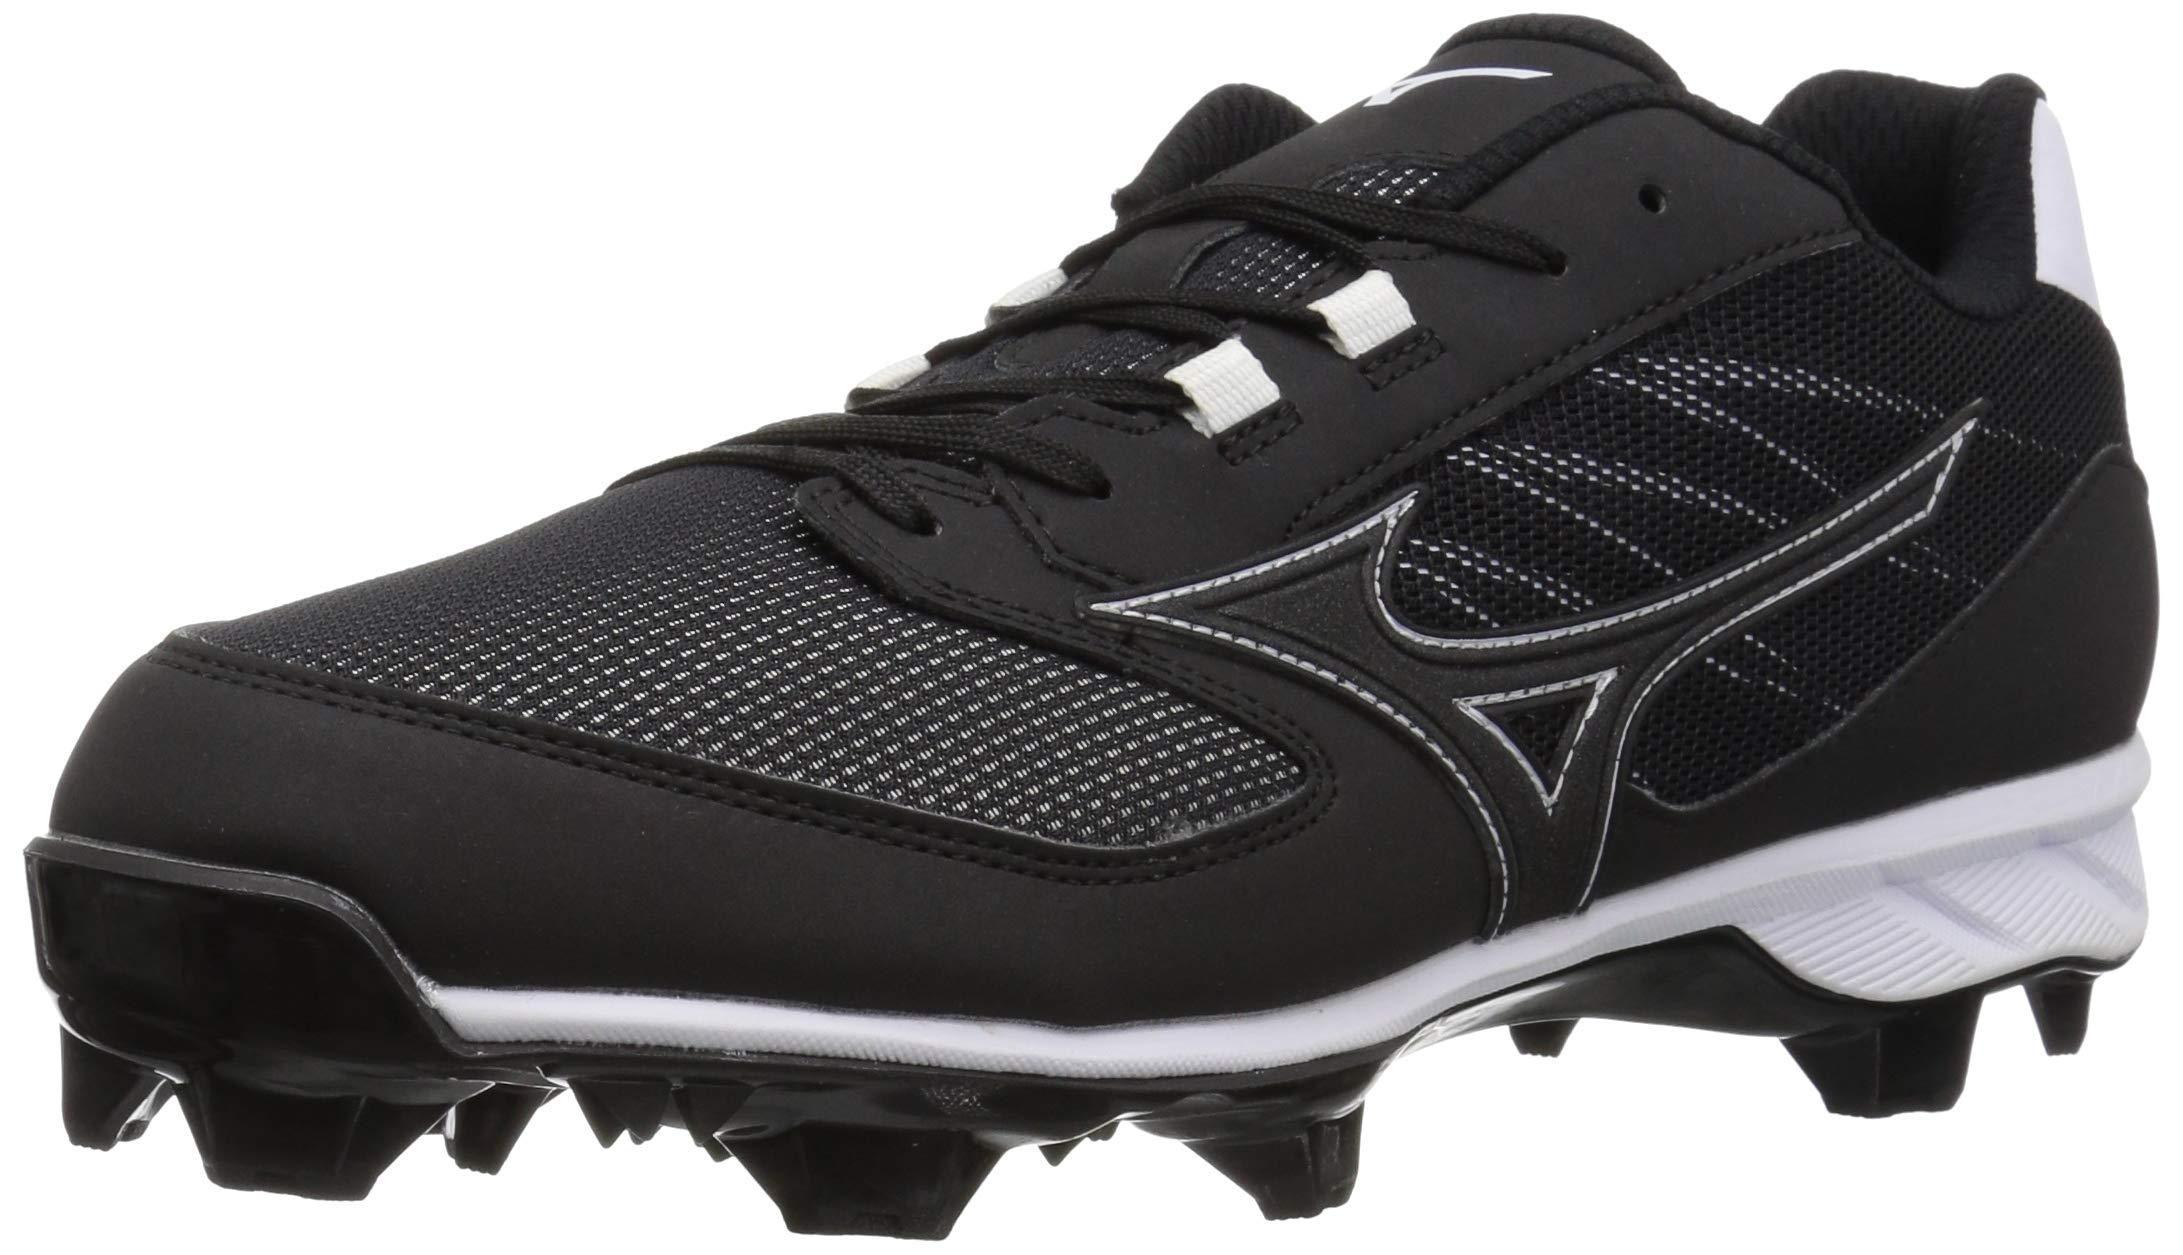 Mizuno Men's 9-Spike Advanced Dominant TPU Molded Baseball Cleat Shoe, Black/White, 9 D US